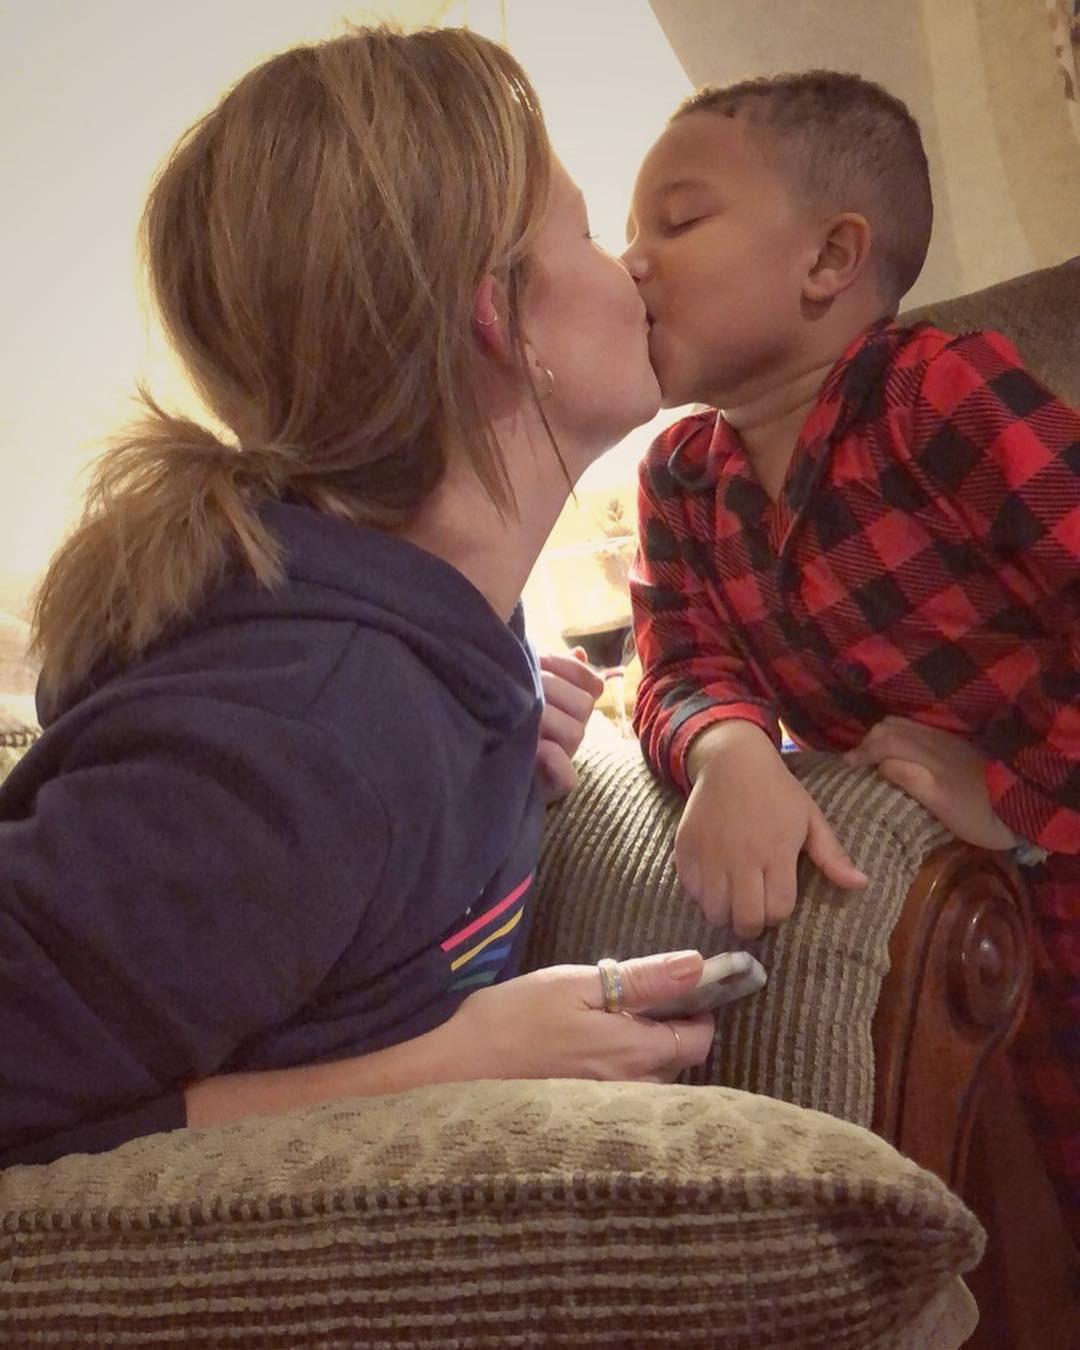 Paula Goodwin e o filho.jpg